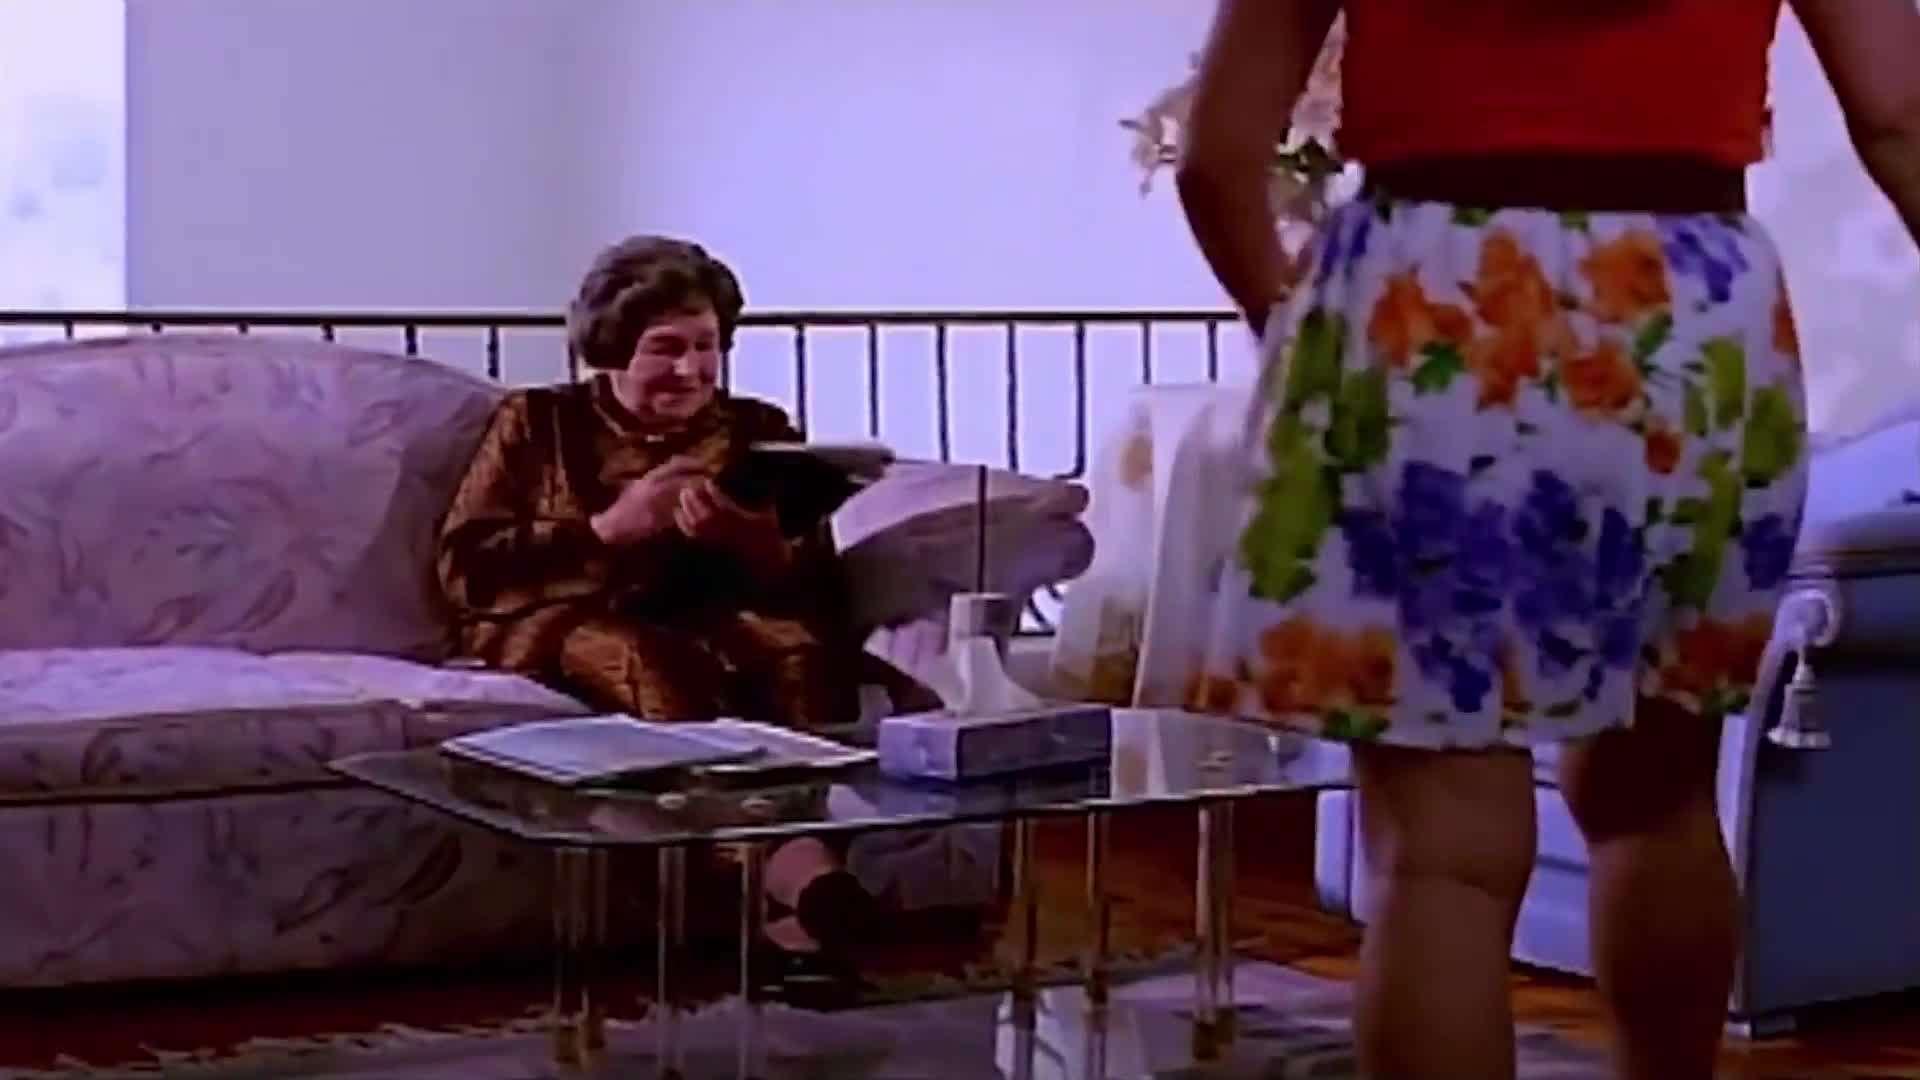 [فيلم][تورنت][تحميل][استاكوزا][1996][1080p][Web-DL] 19 arabp2p.com